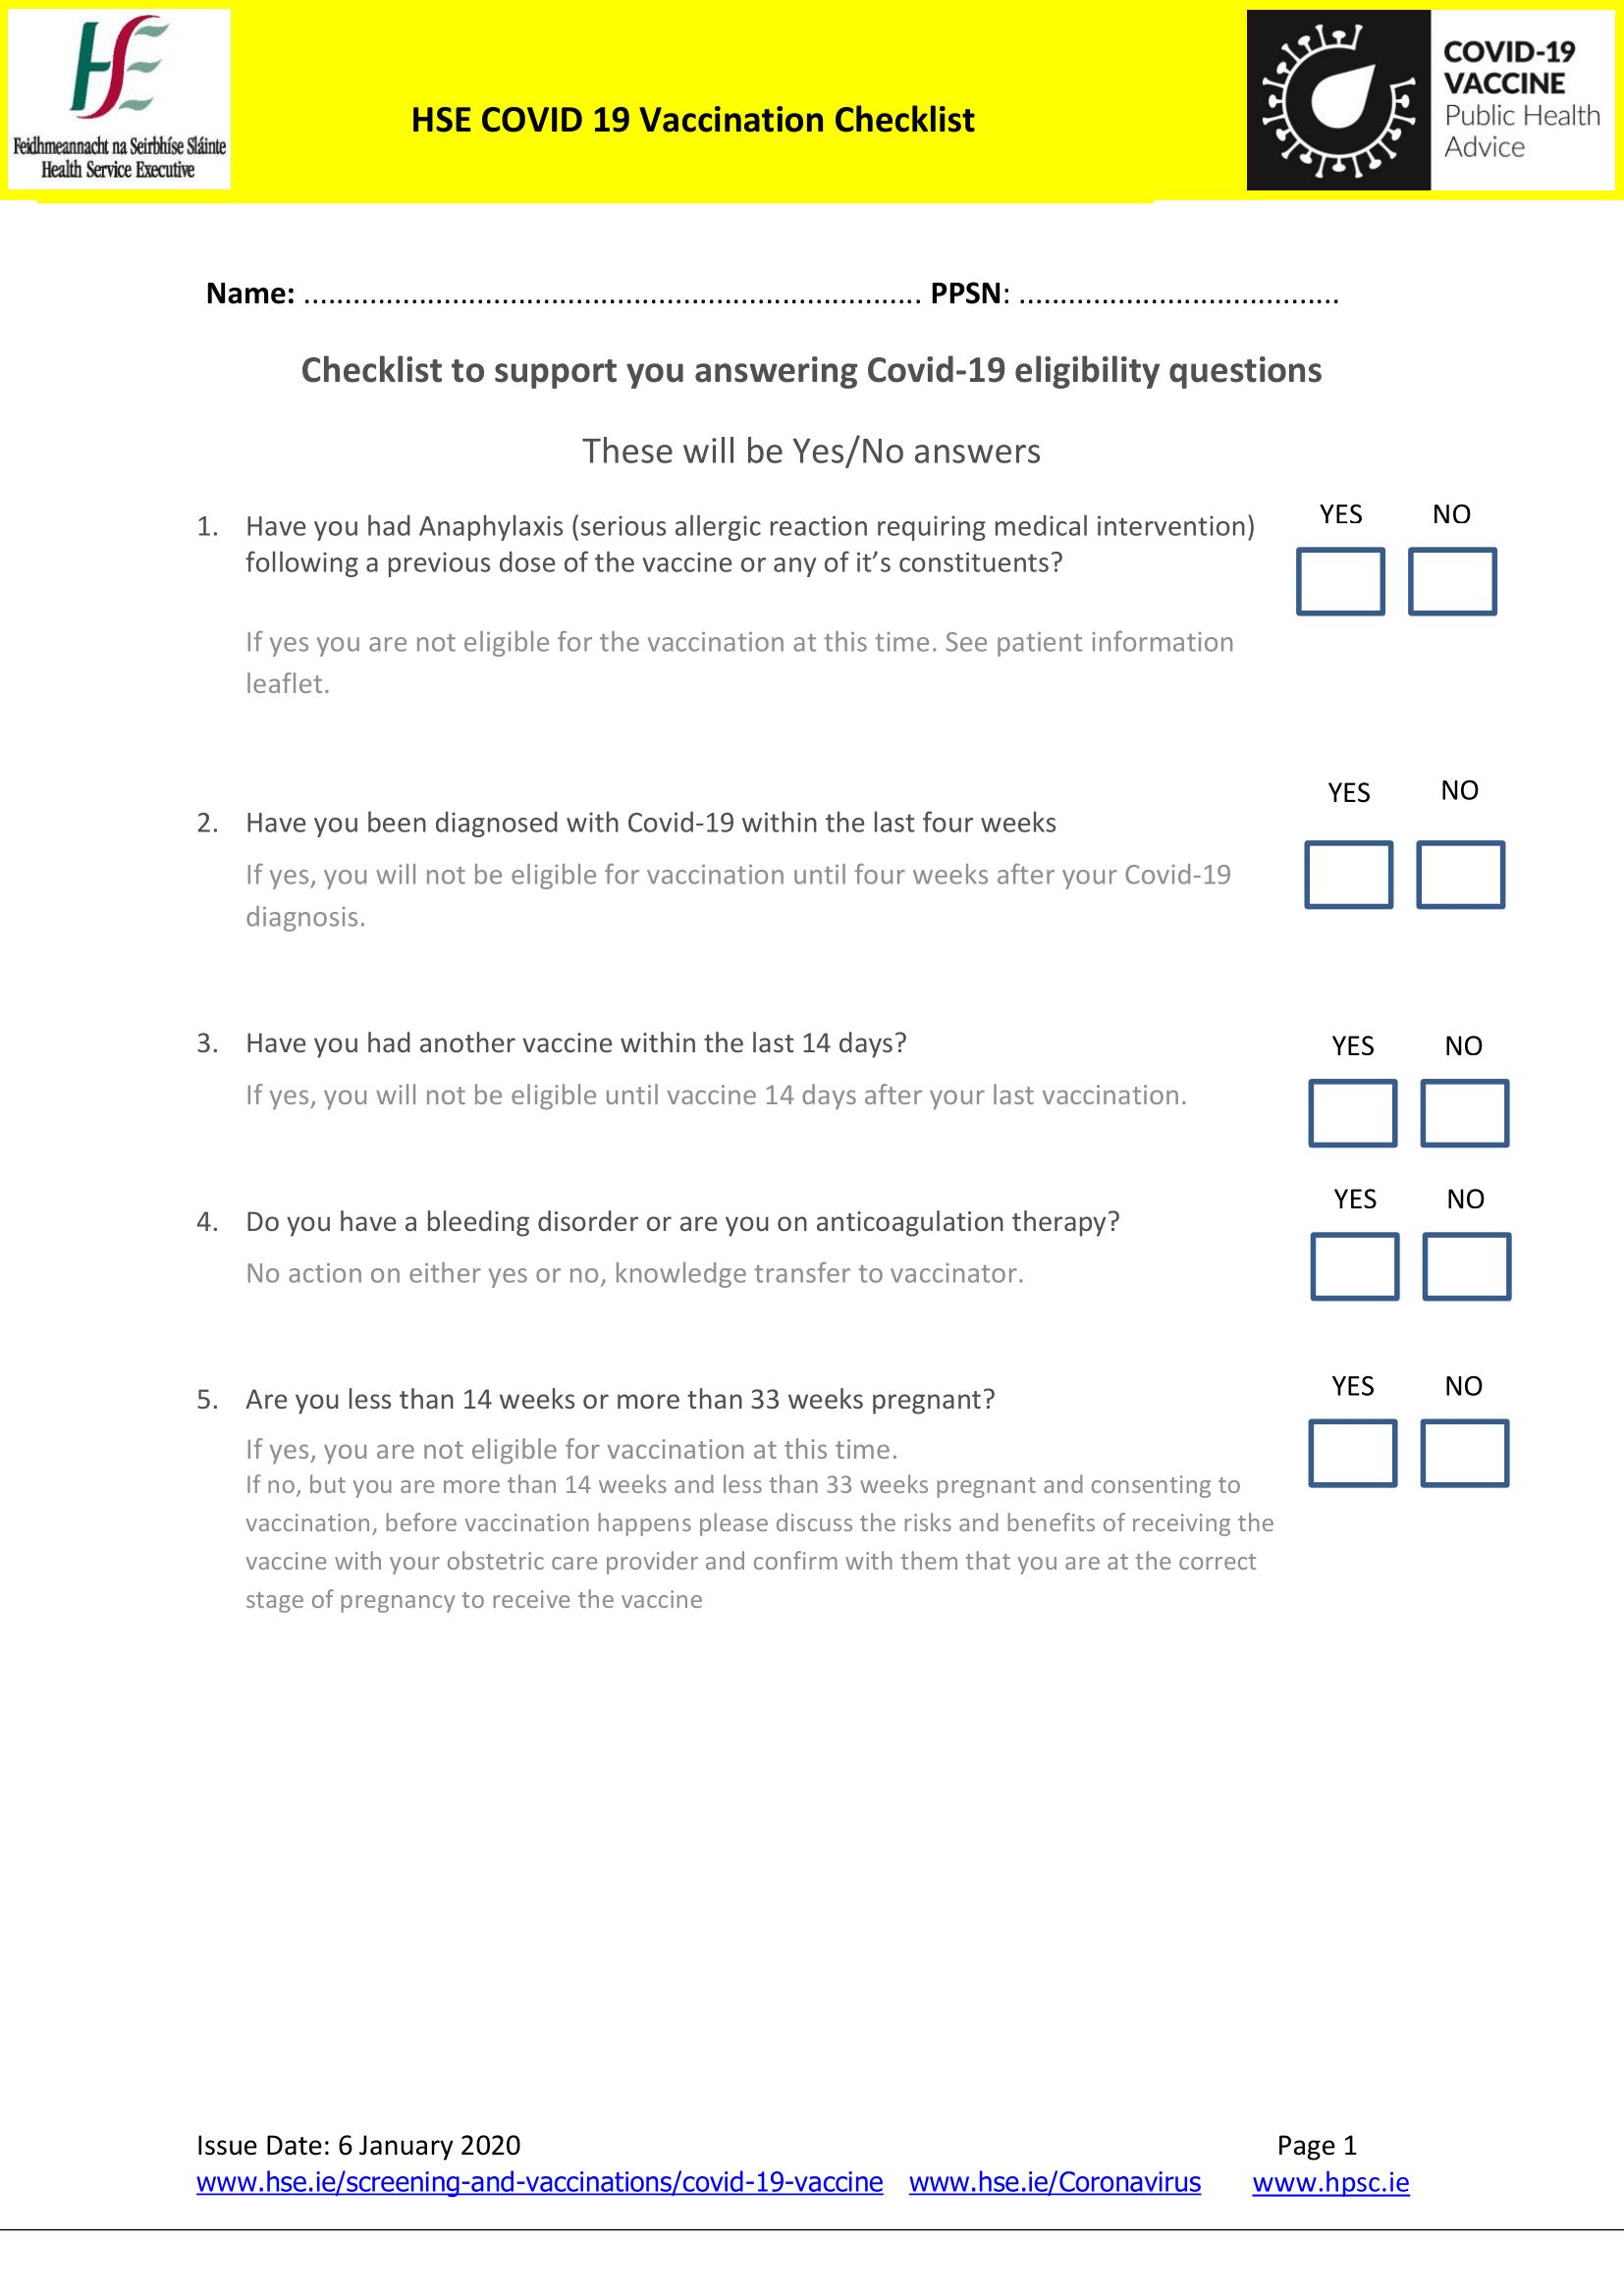 hse-covid-19-vaccination-checklist-1